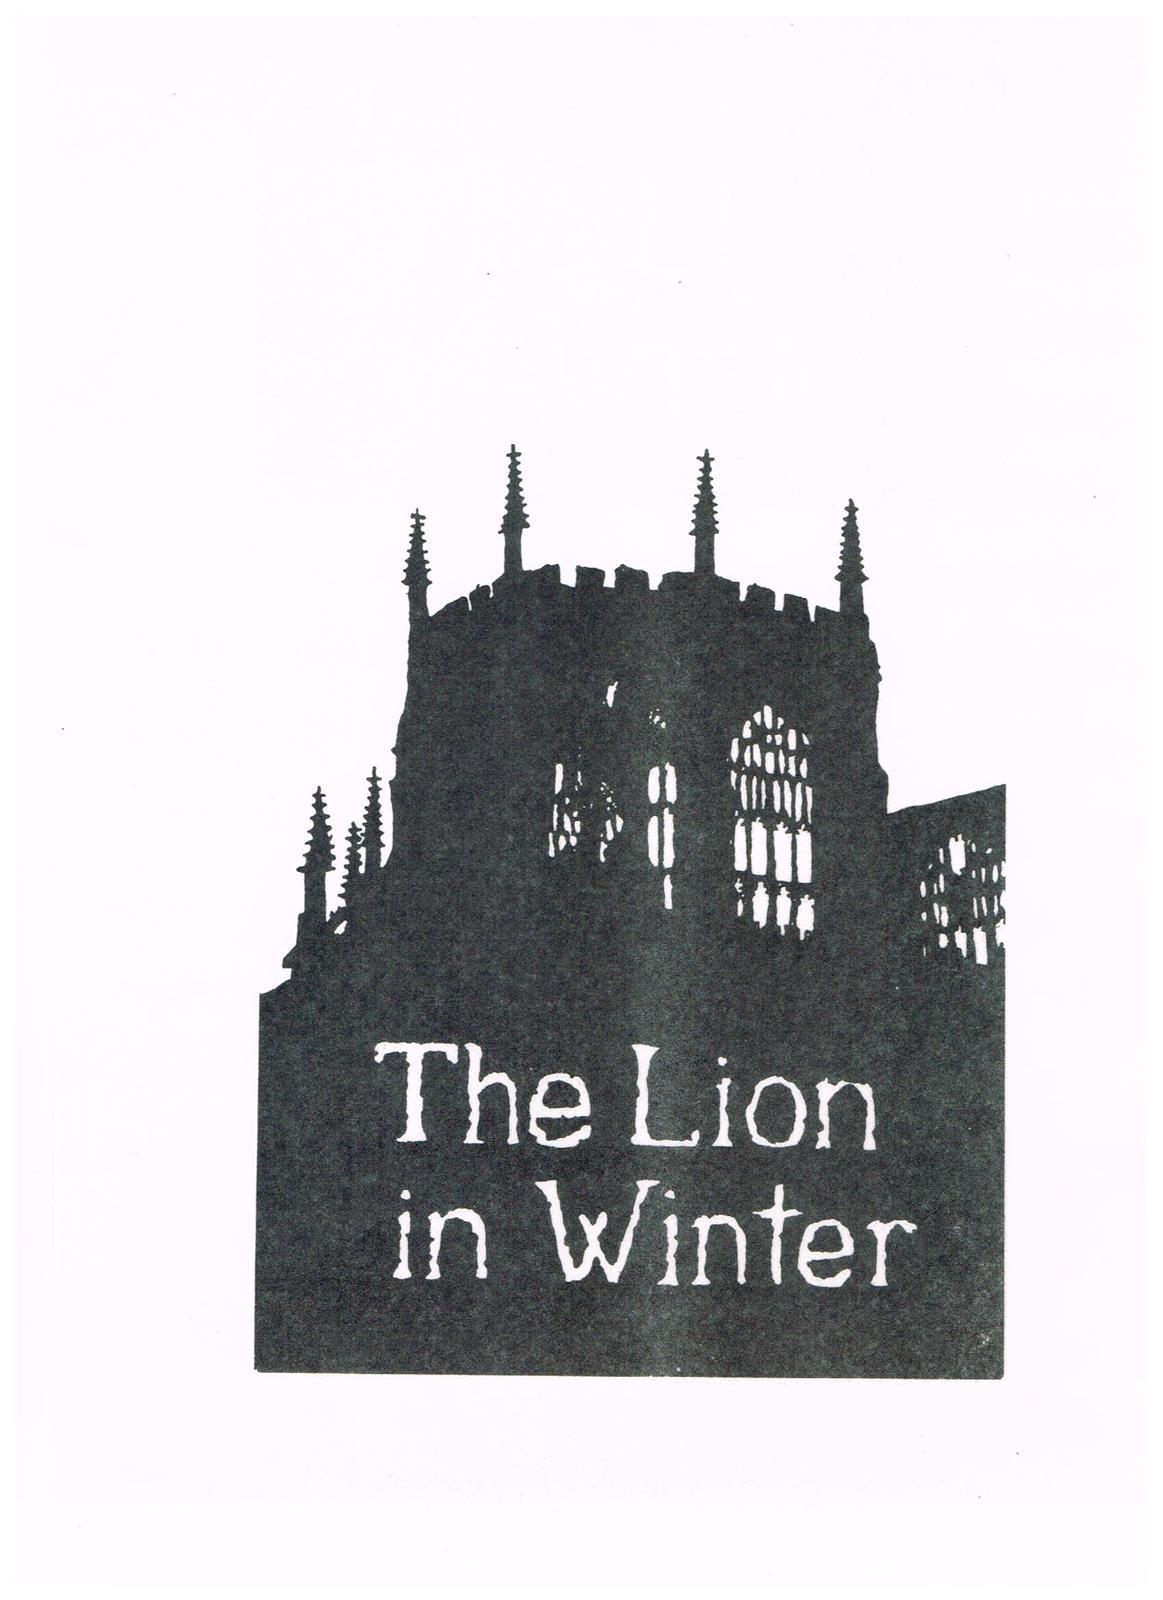 Phoenix Theatre Lion in Winter Nov. 1970 001